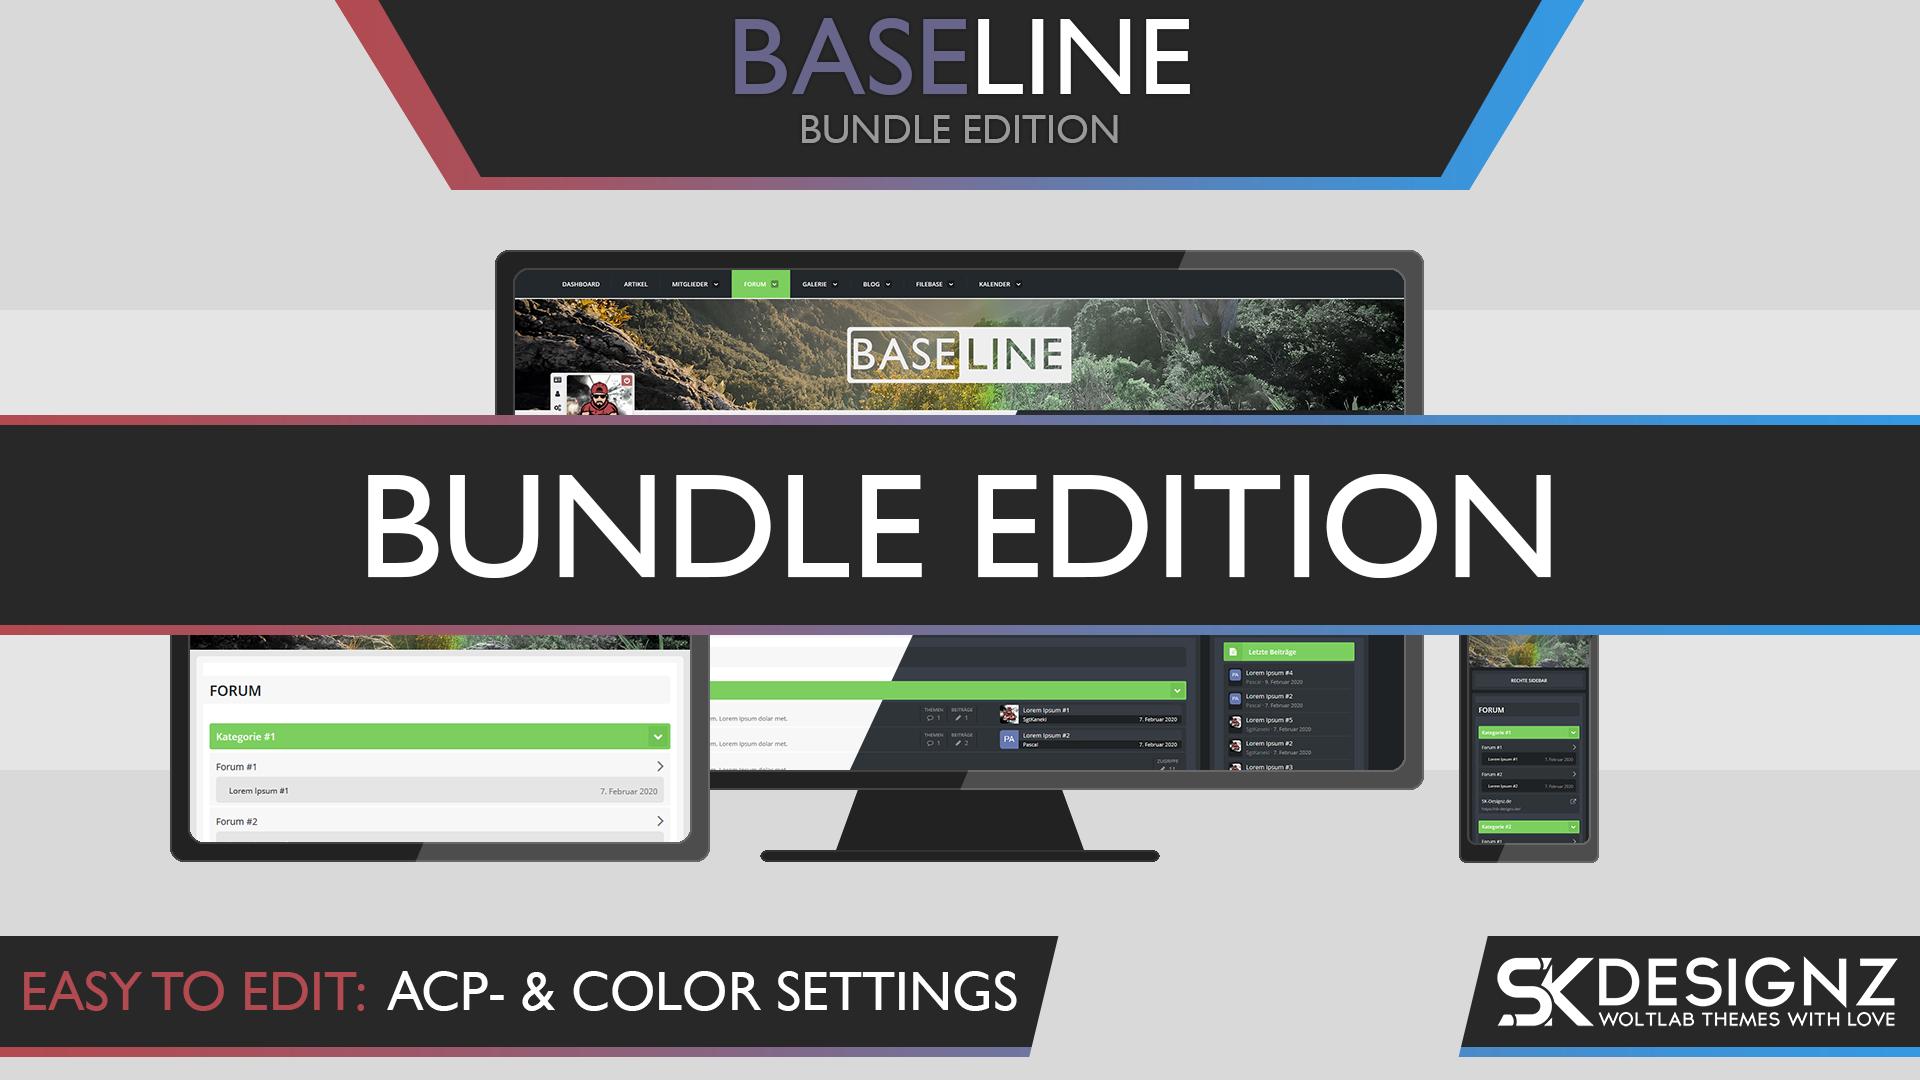 BaseLine - Bundle Edition